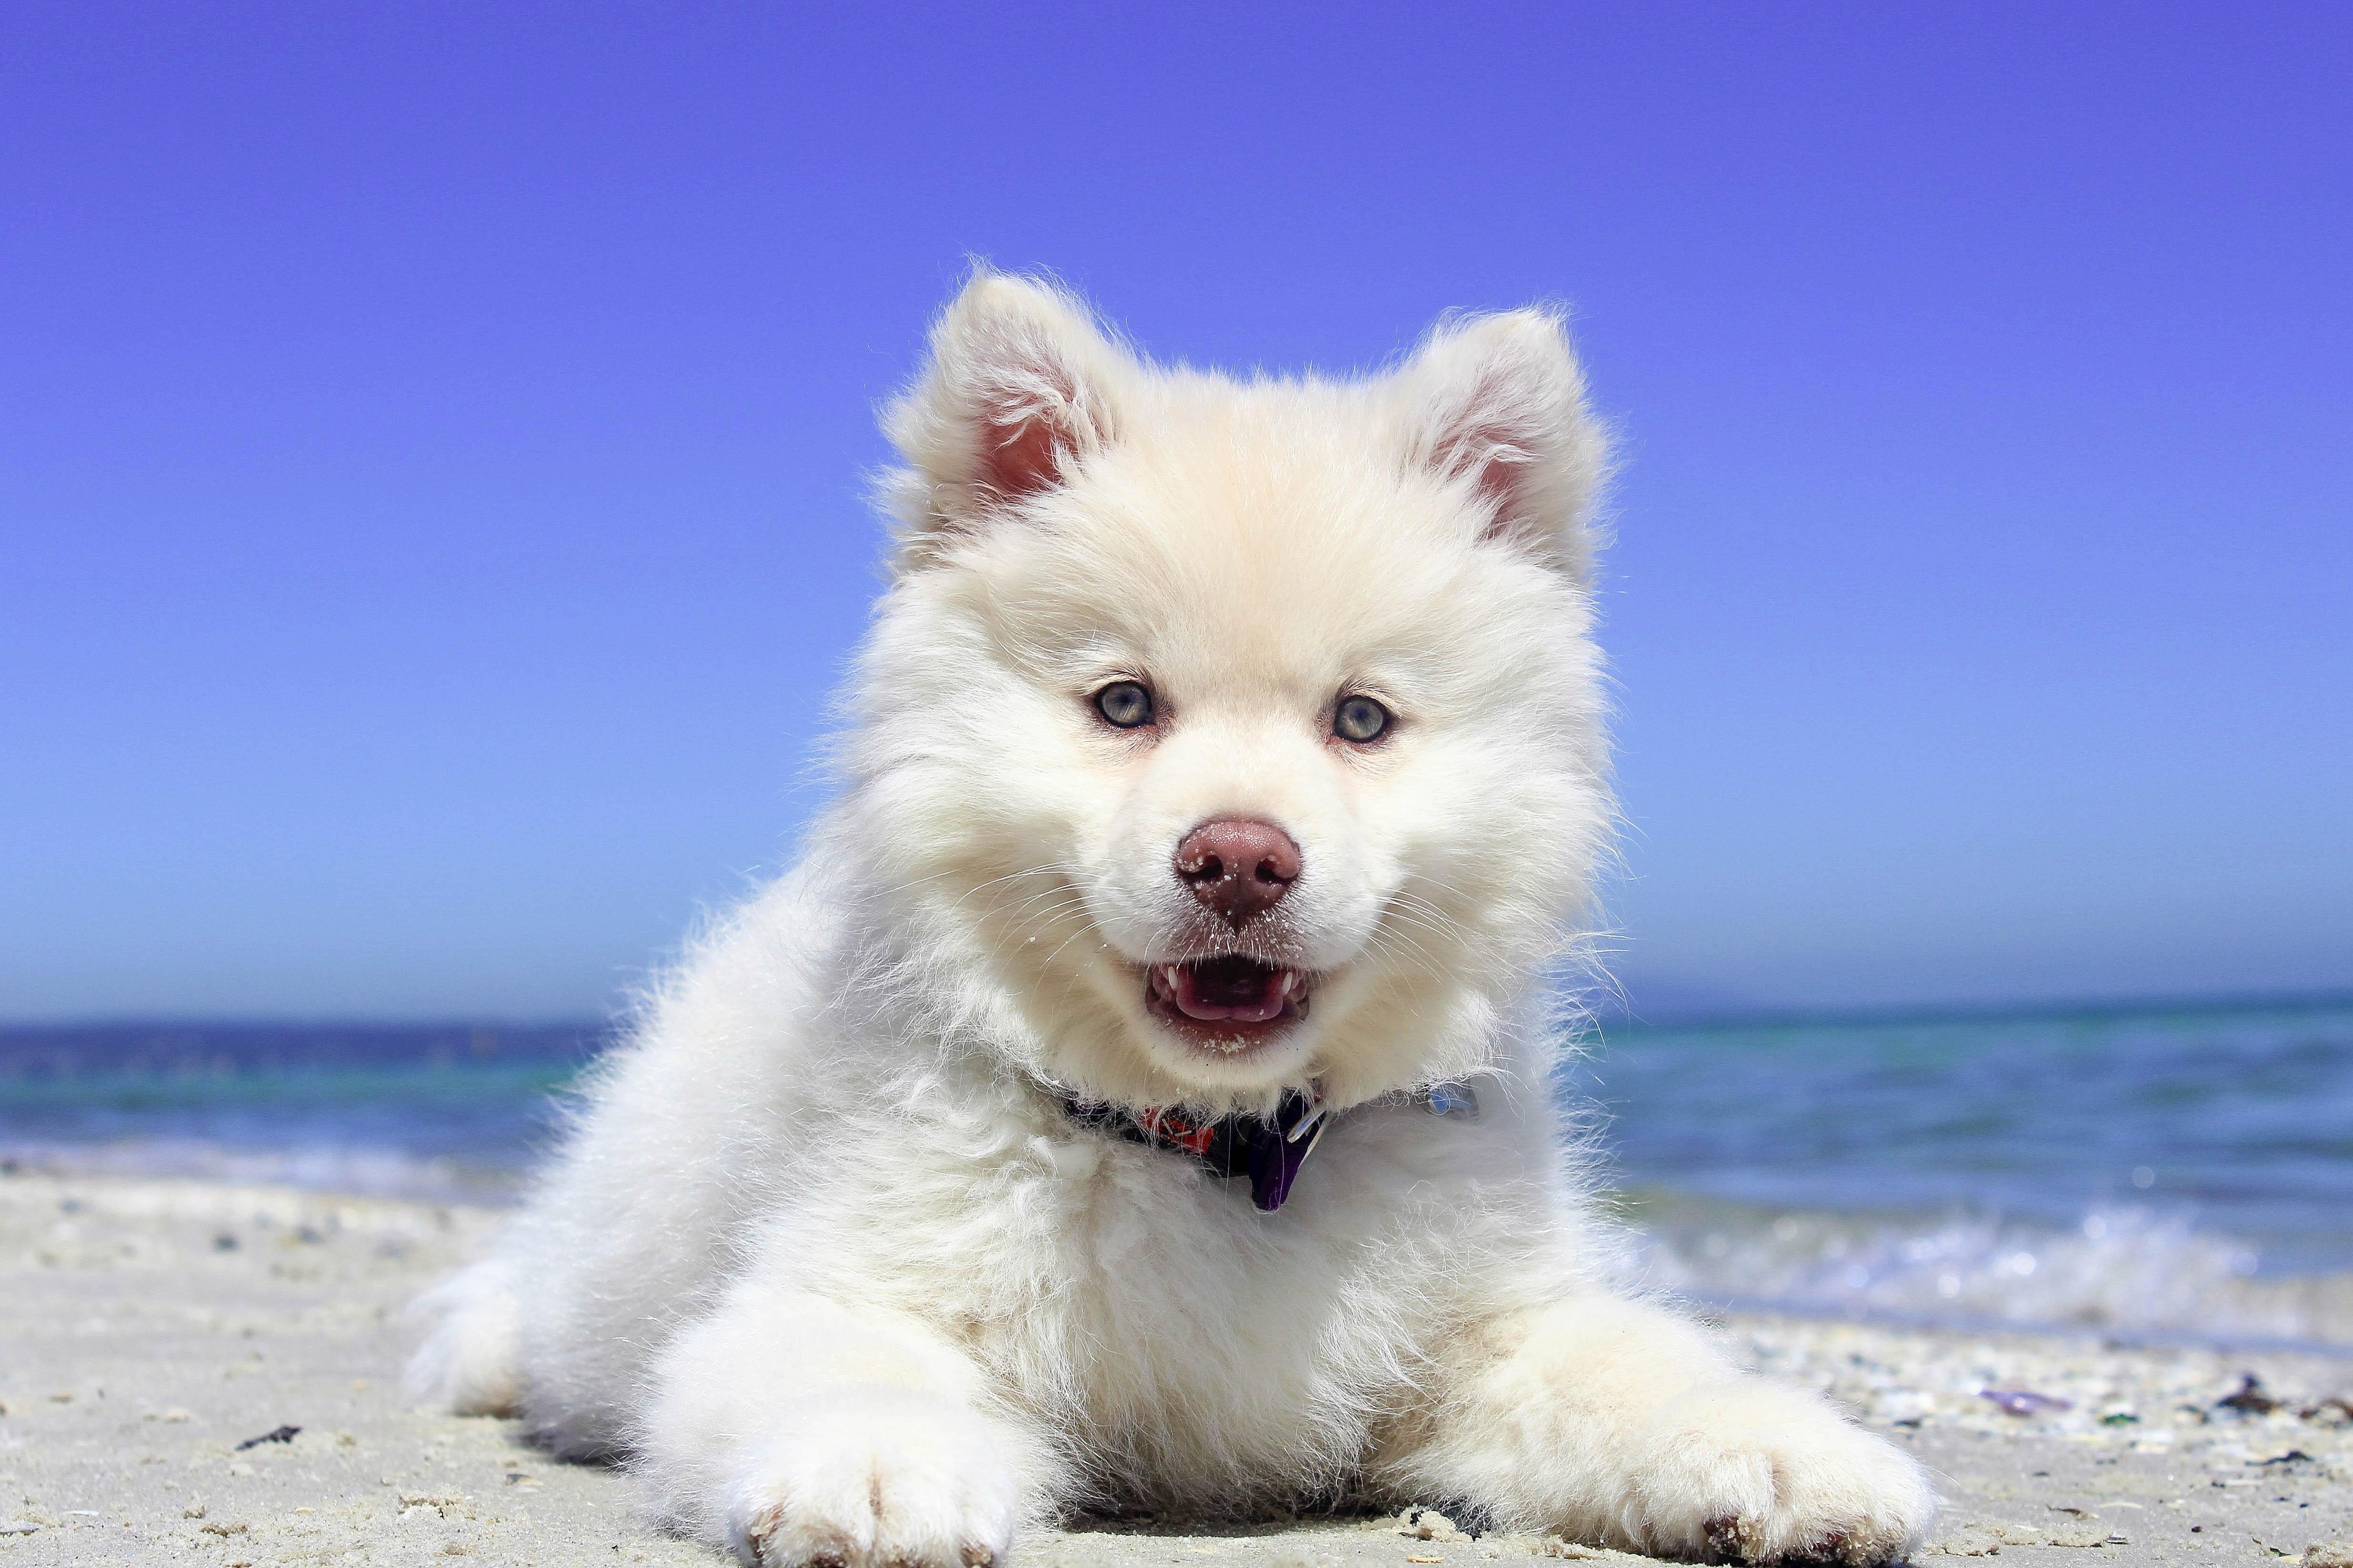 Wallpaper Open Mouth Pomeranian Puppy Lying Vertebrate Dog